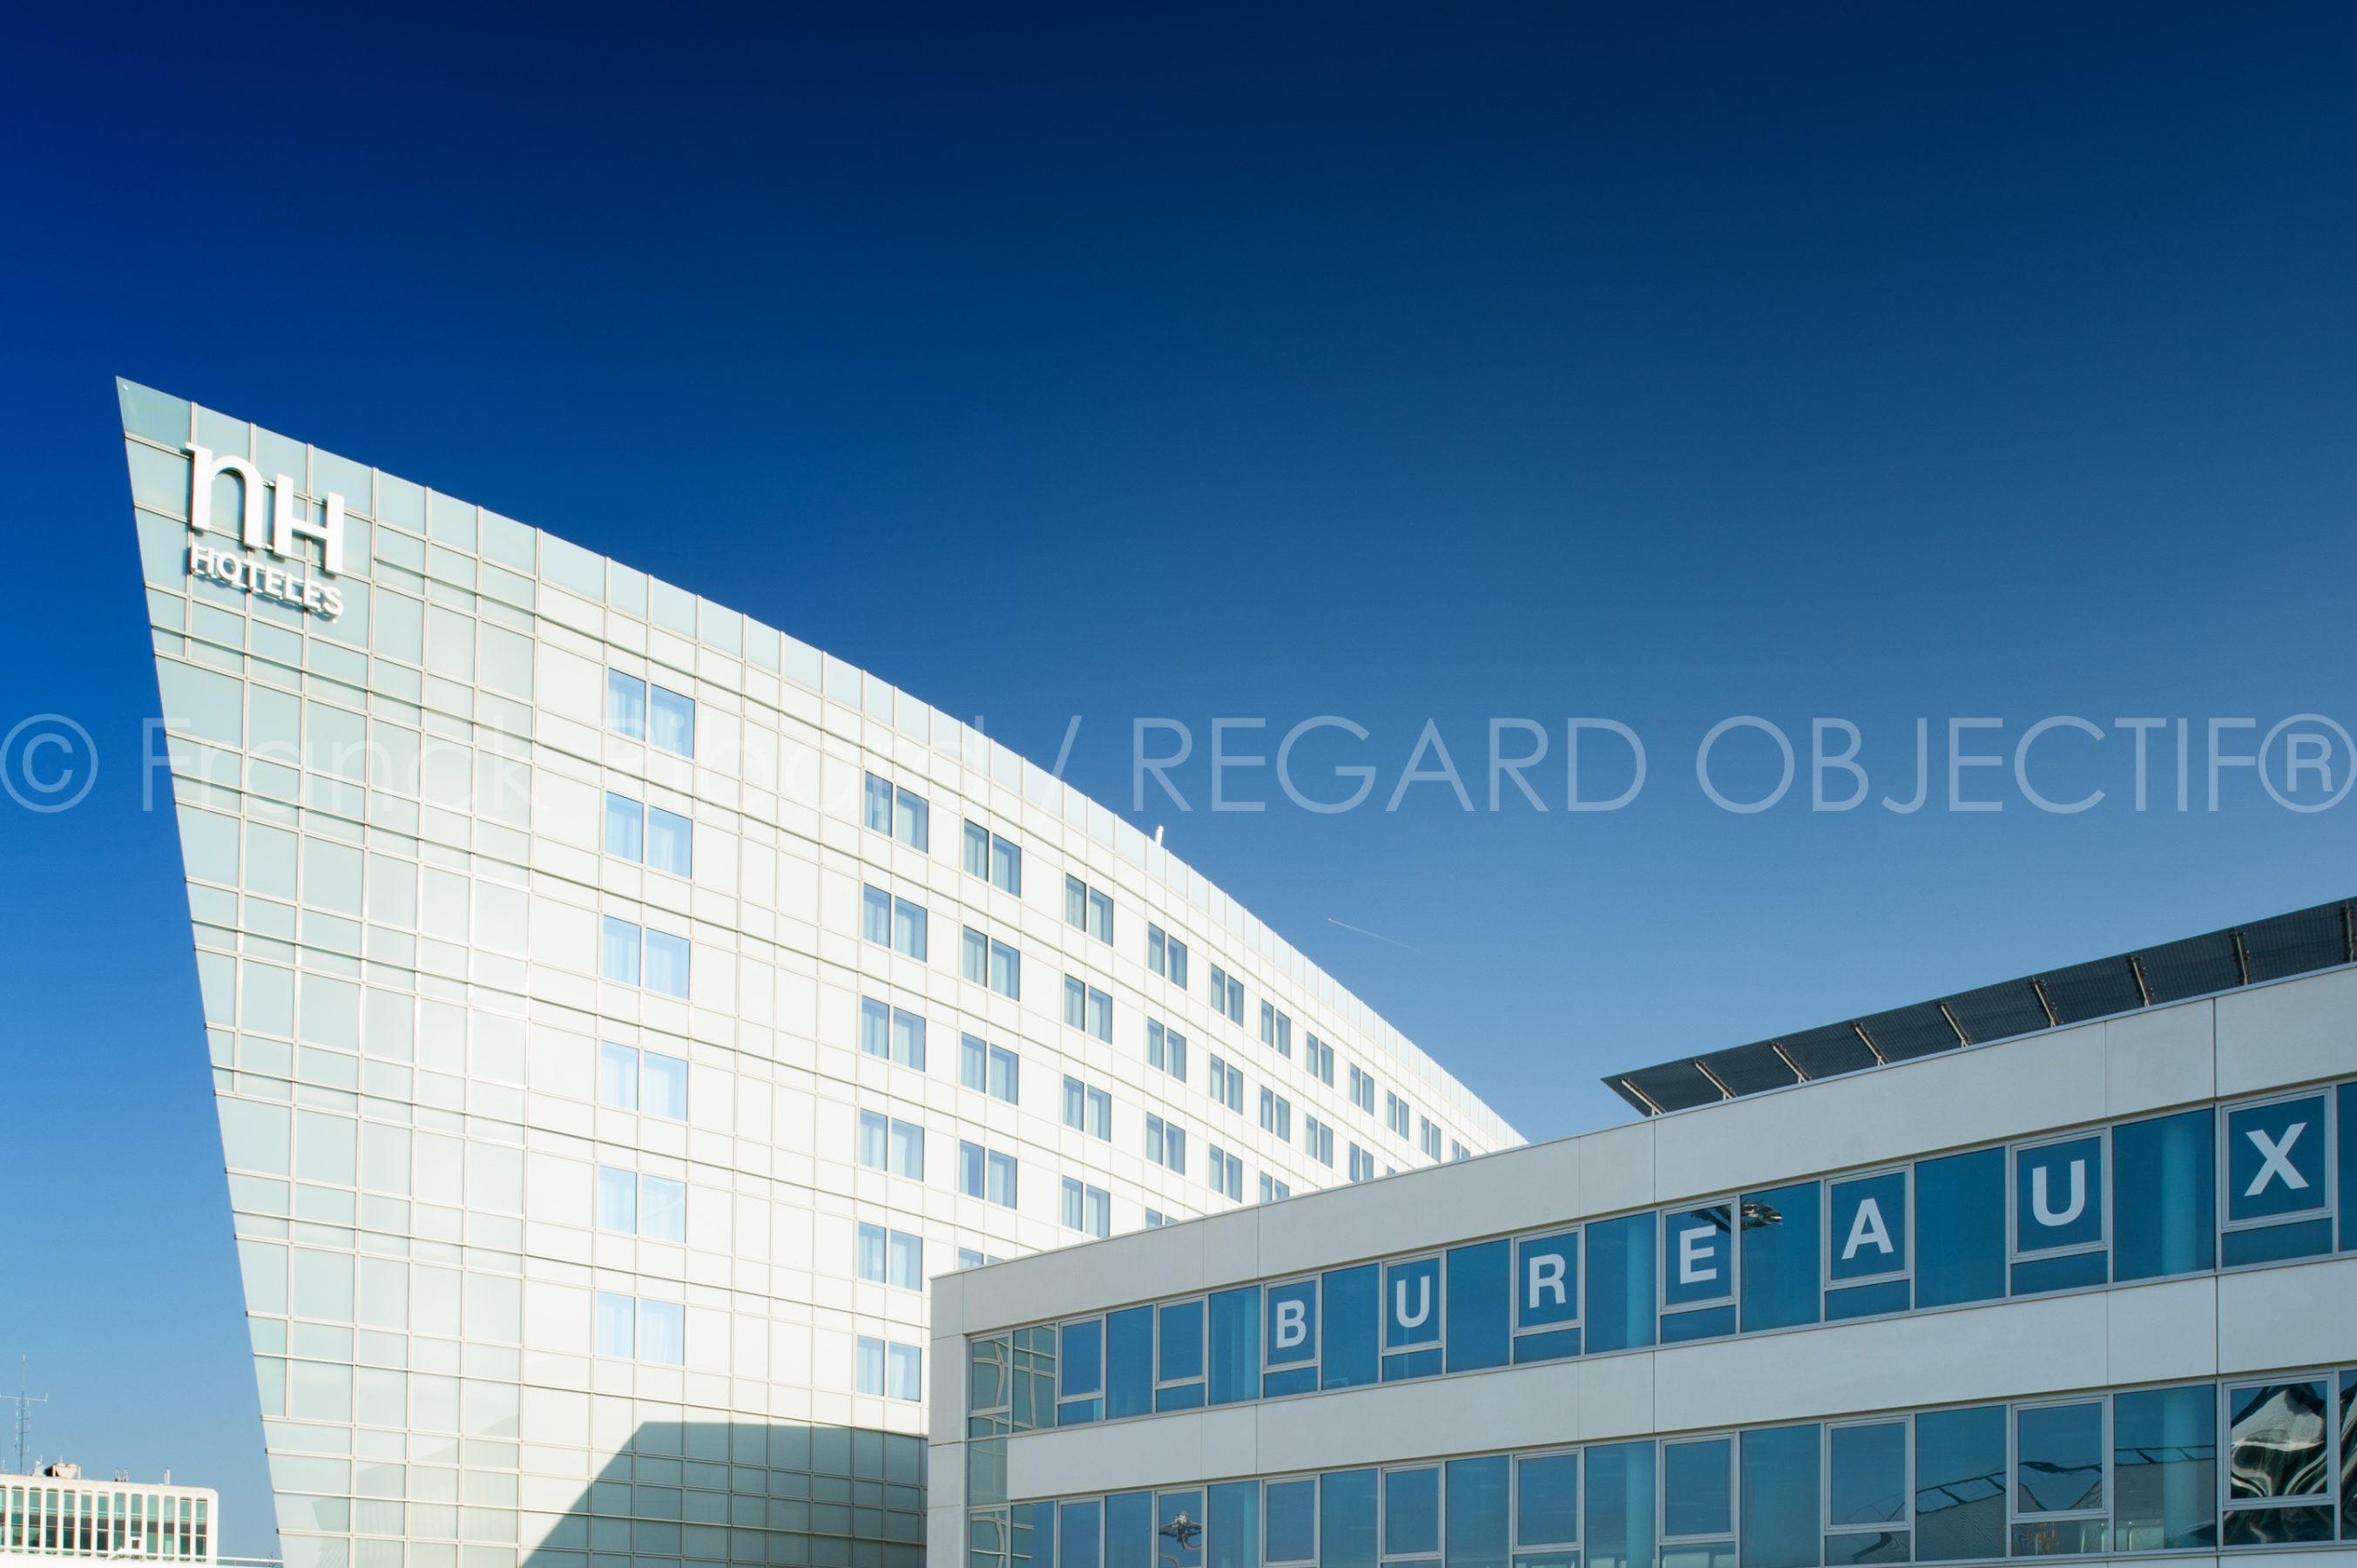 photographie de franck ribard - regard objectif - photographe architecture lyon - NH Hotel